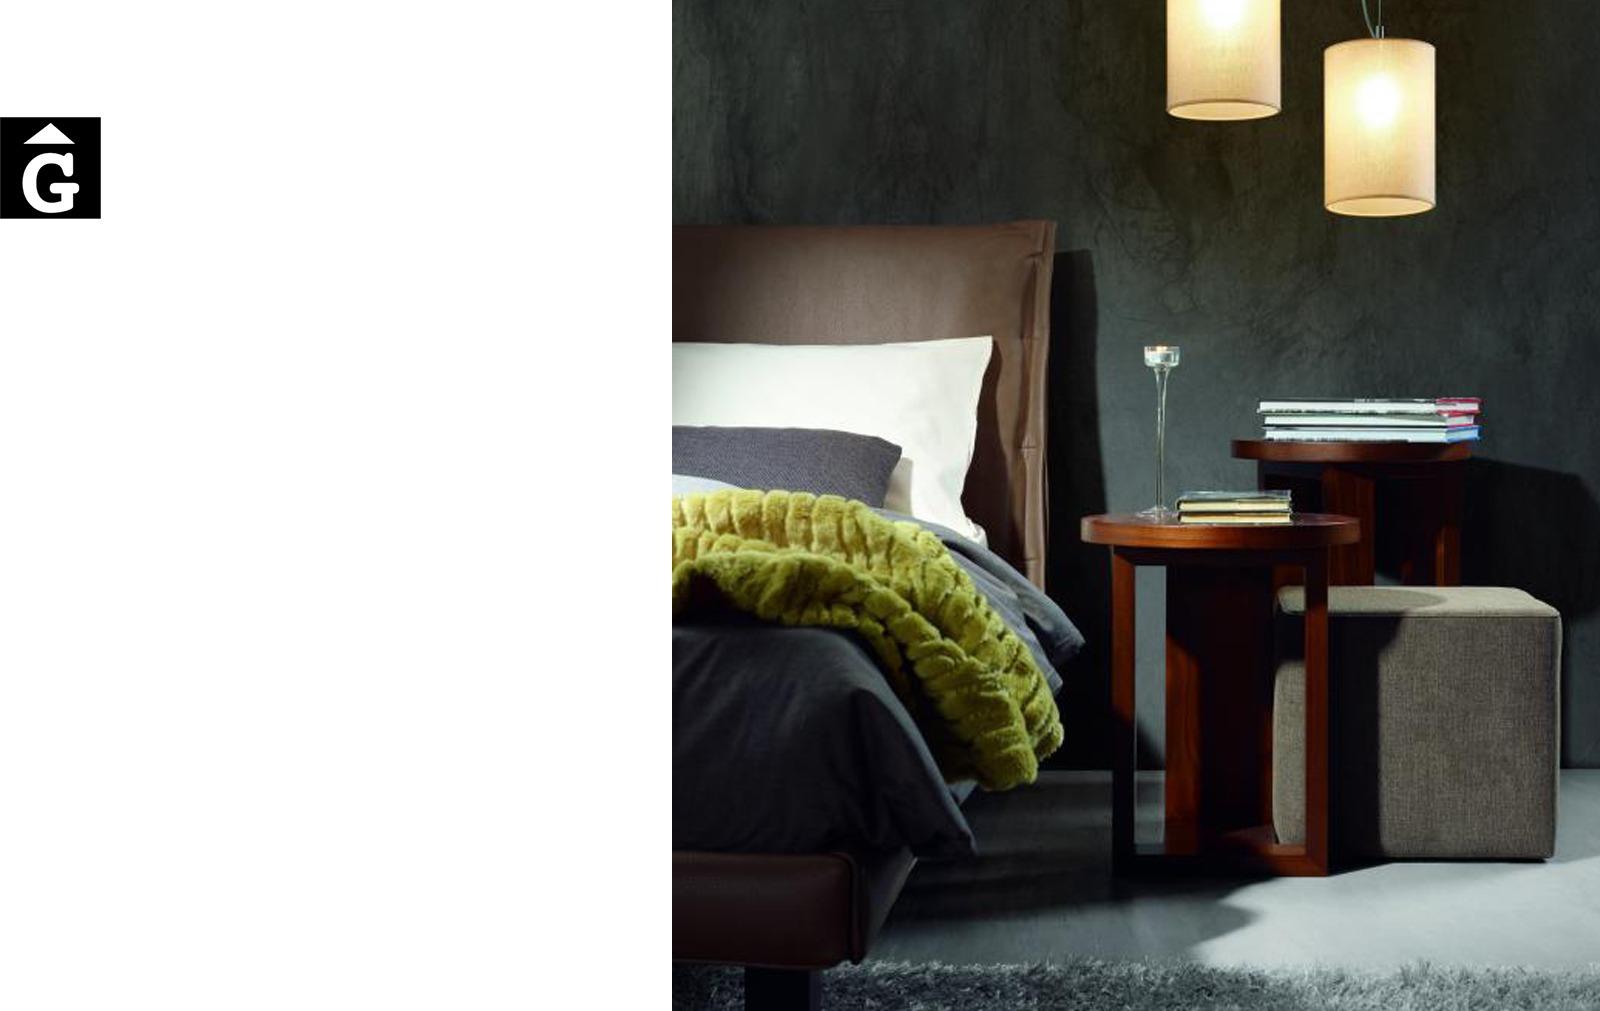 Rho llit entapissat frontal detall Moradillo llit entapissats per mobles Gifreu